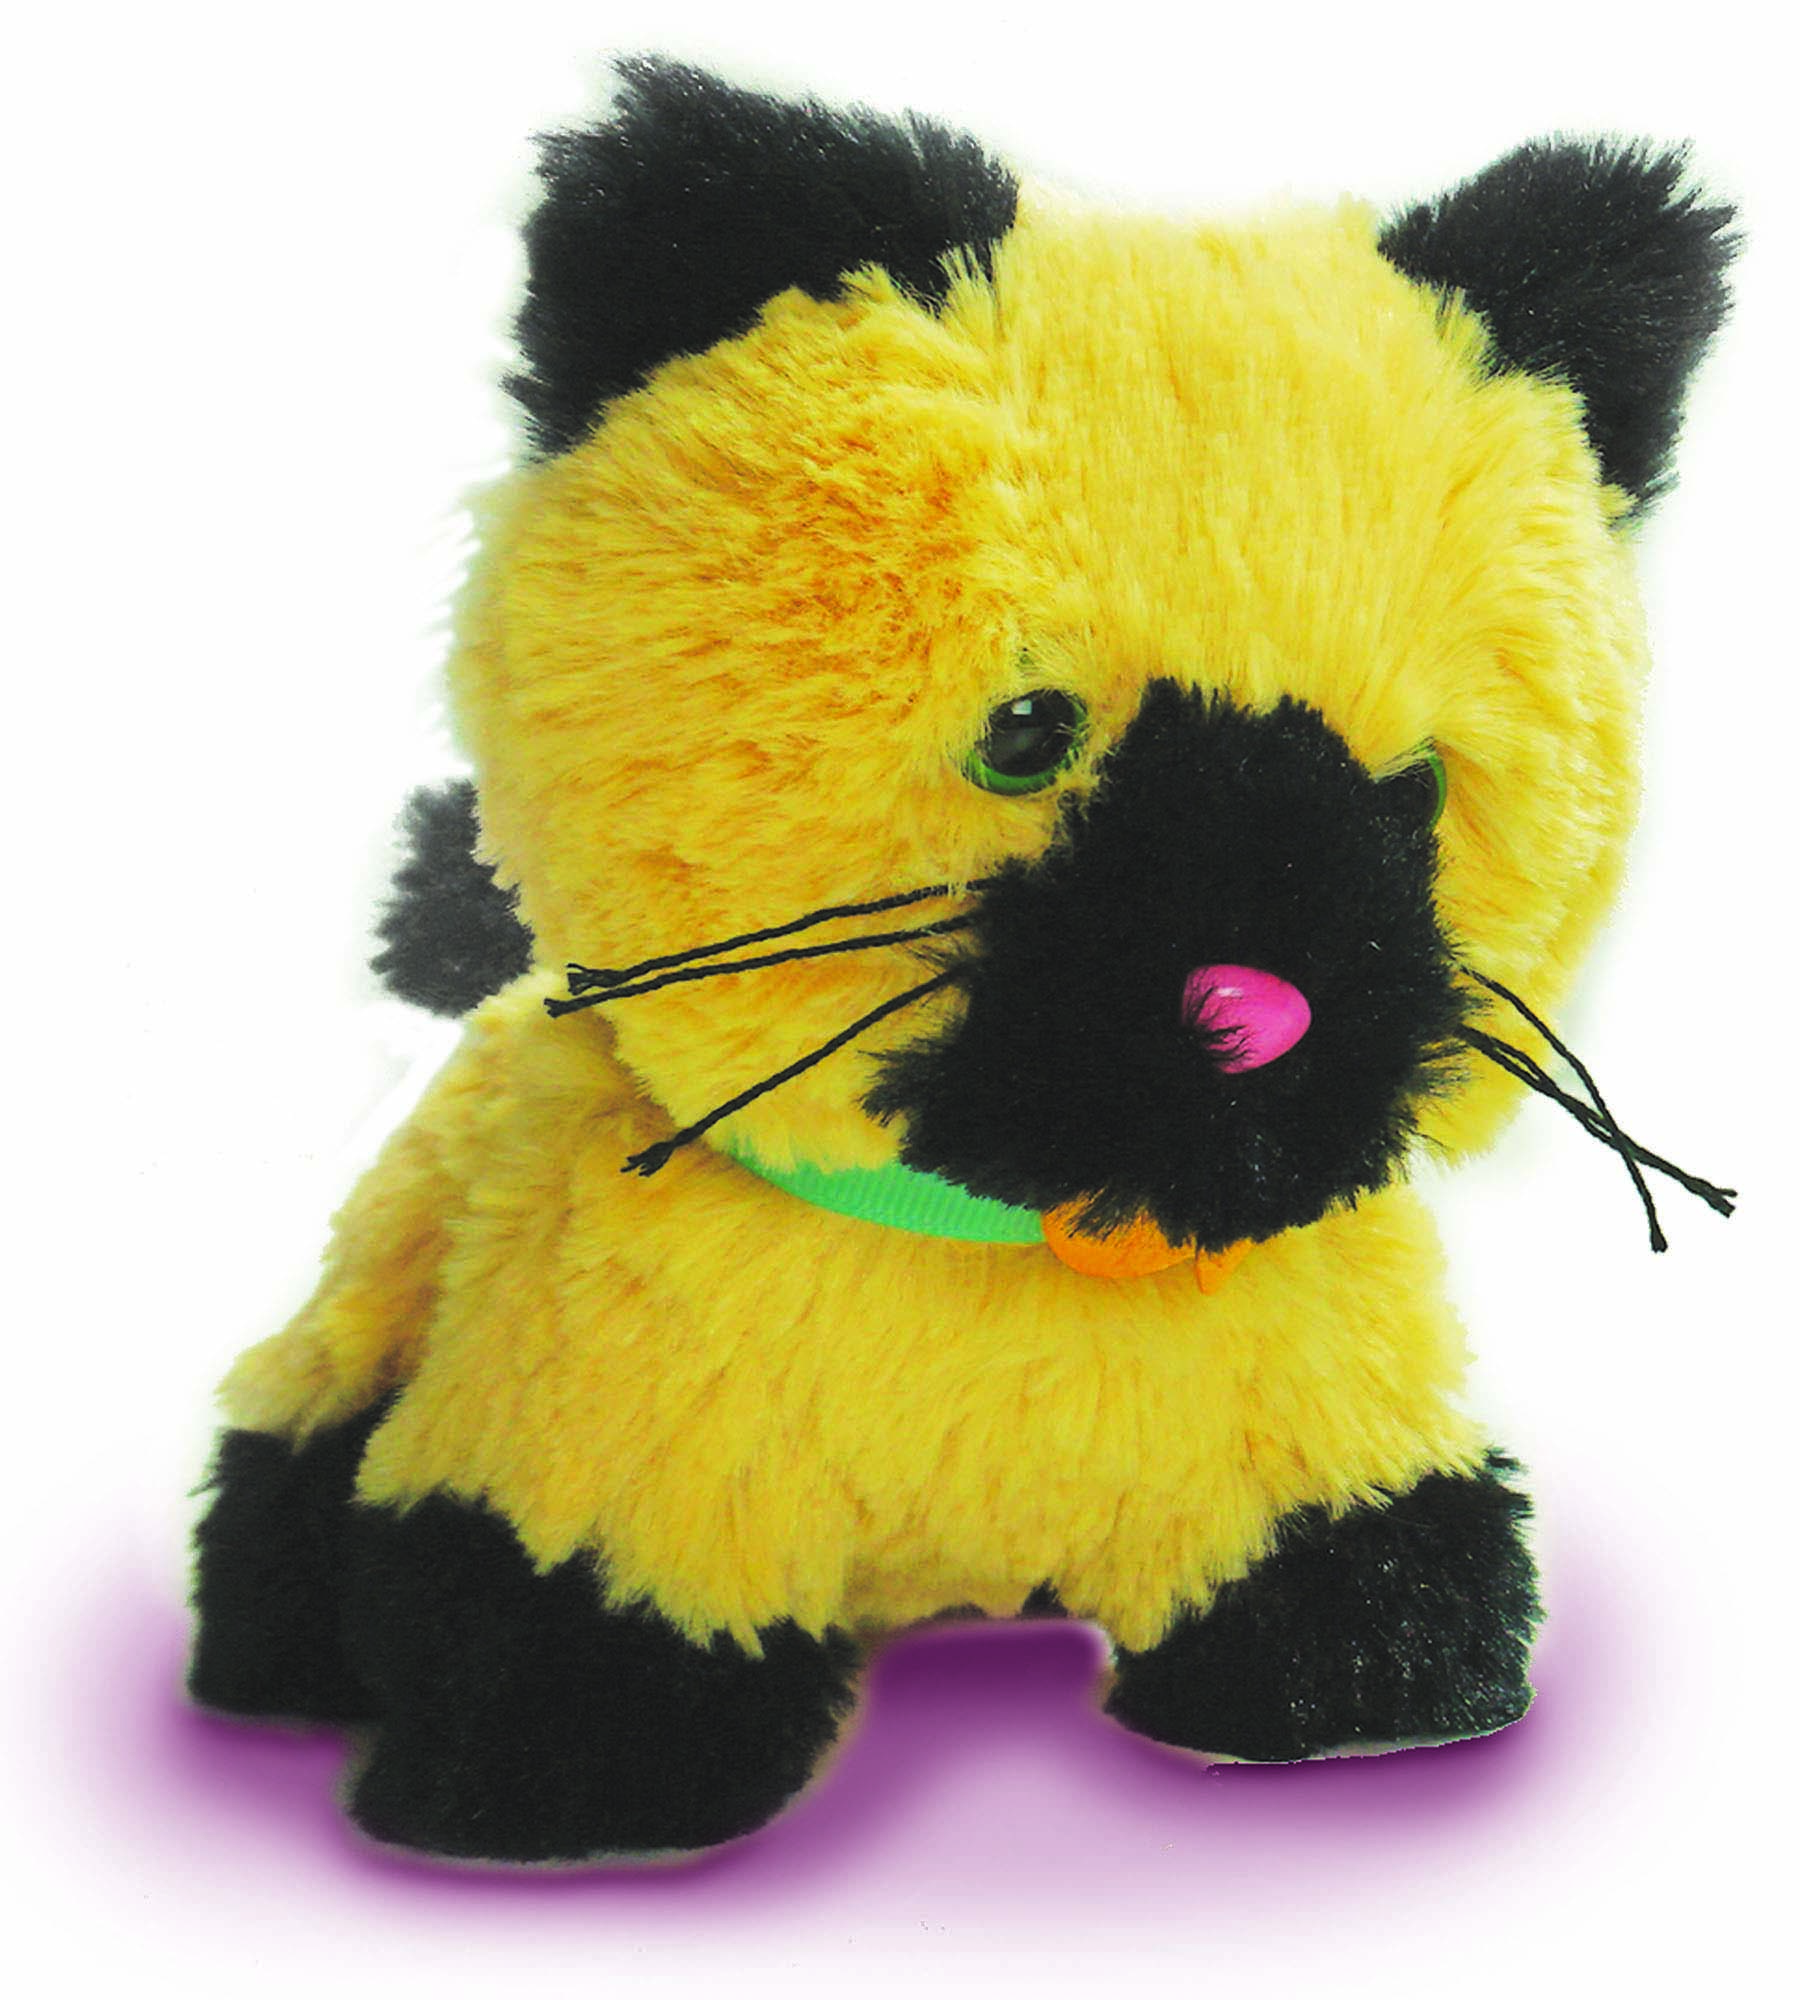 My Life As Plush Pets - Tan Siamese Cat - Doll Accessory